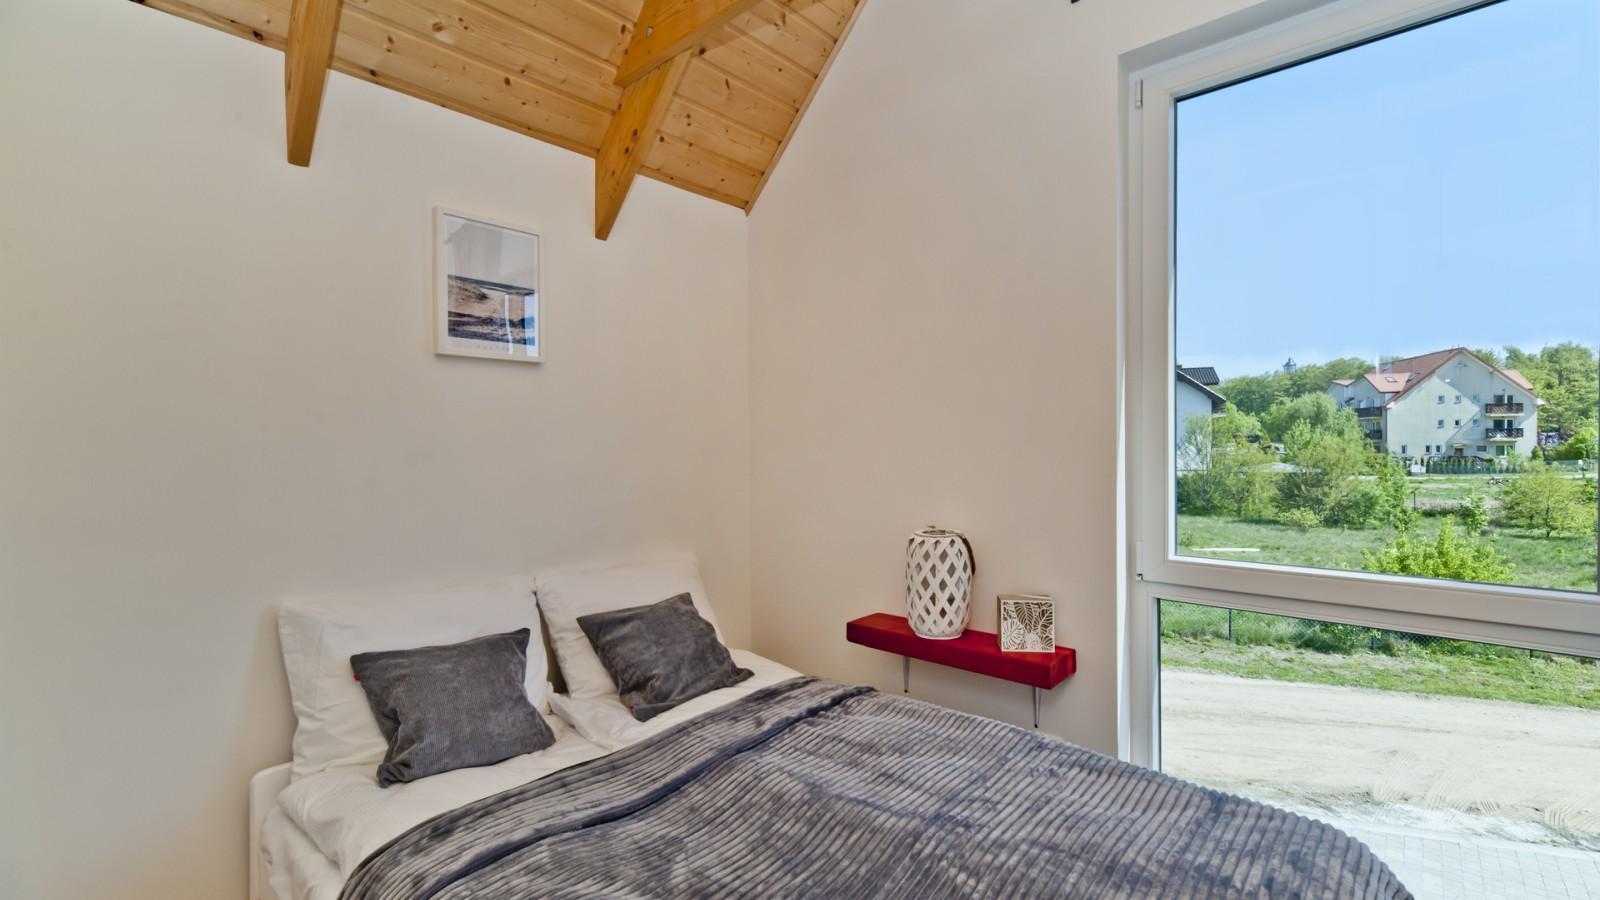 Domek Apartamentowy Scandi 6